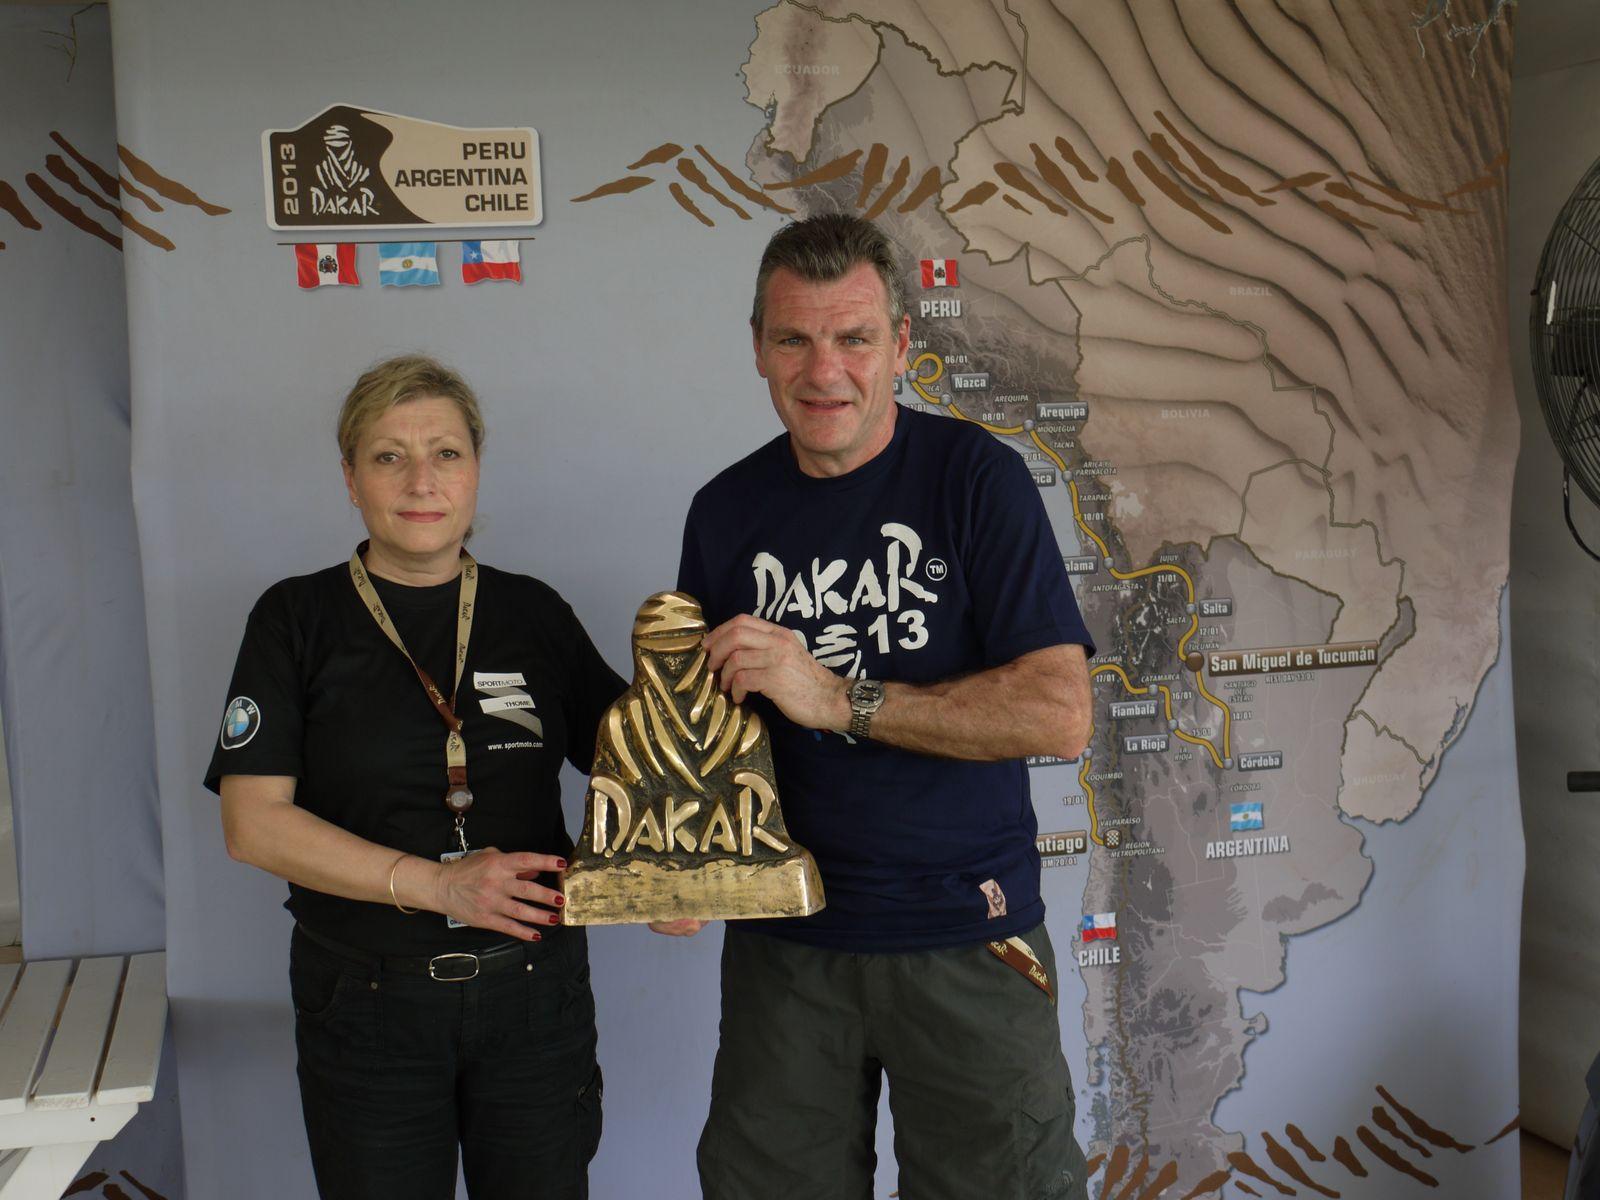 Dakar 2013 - medium